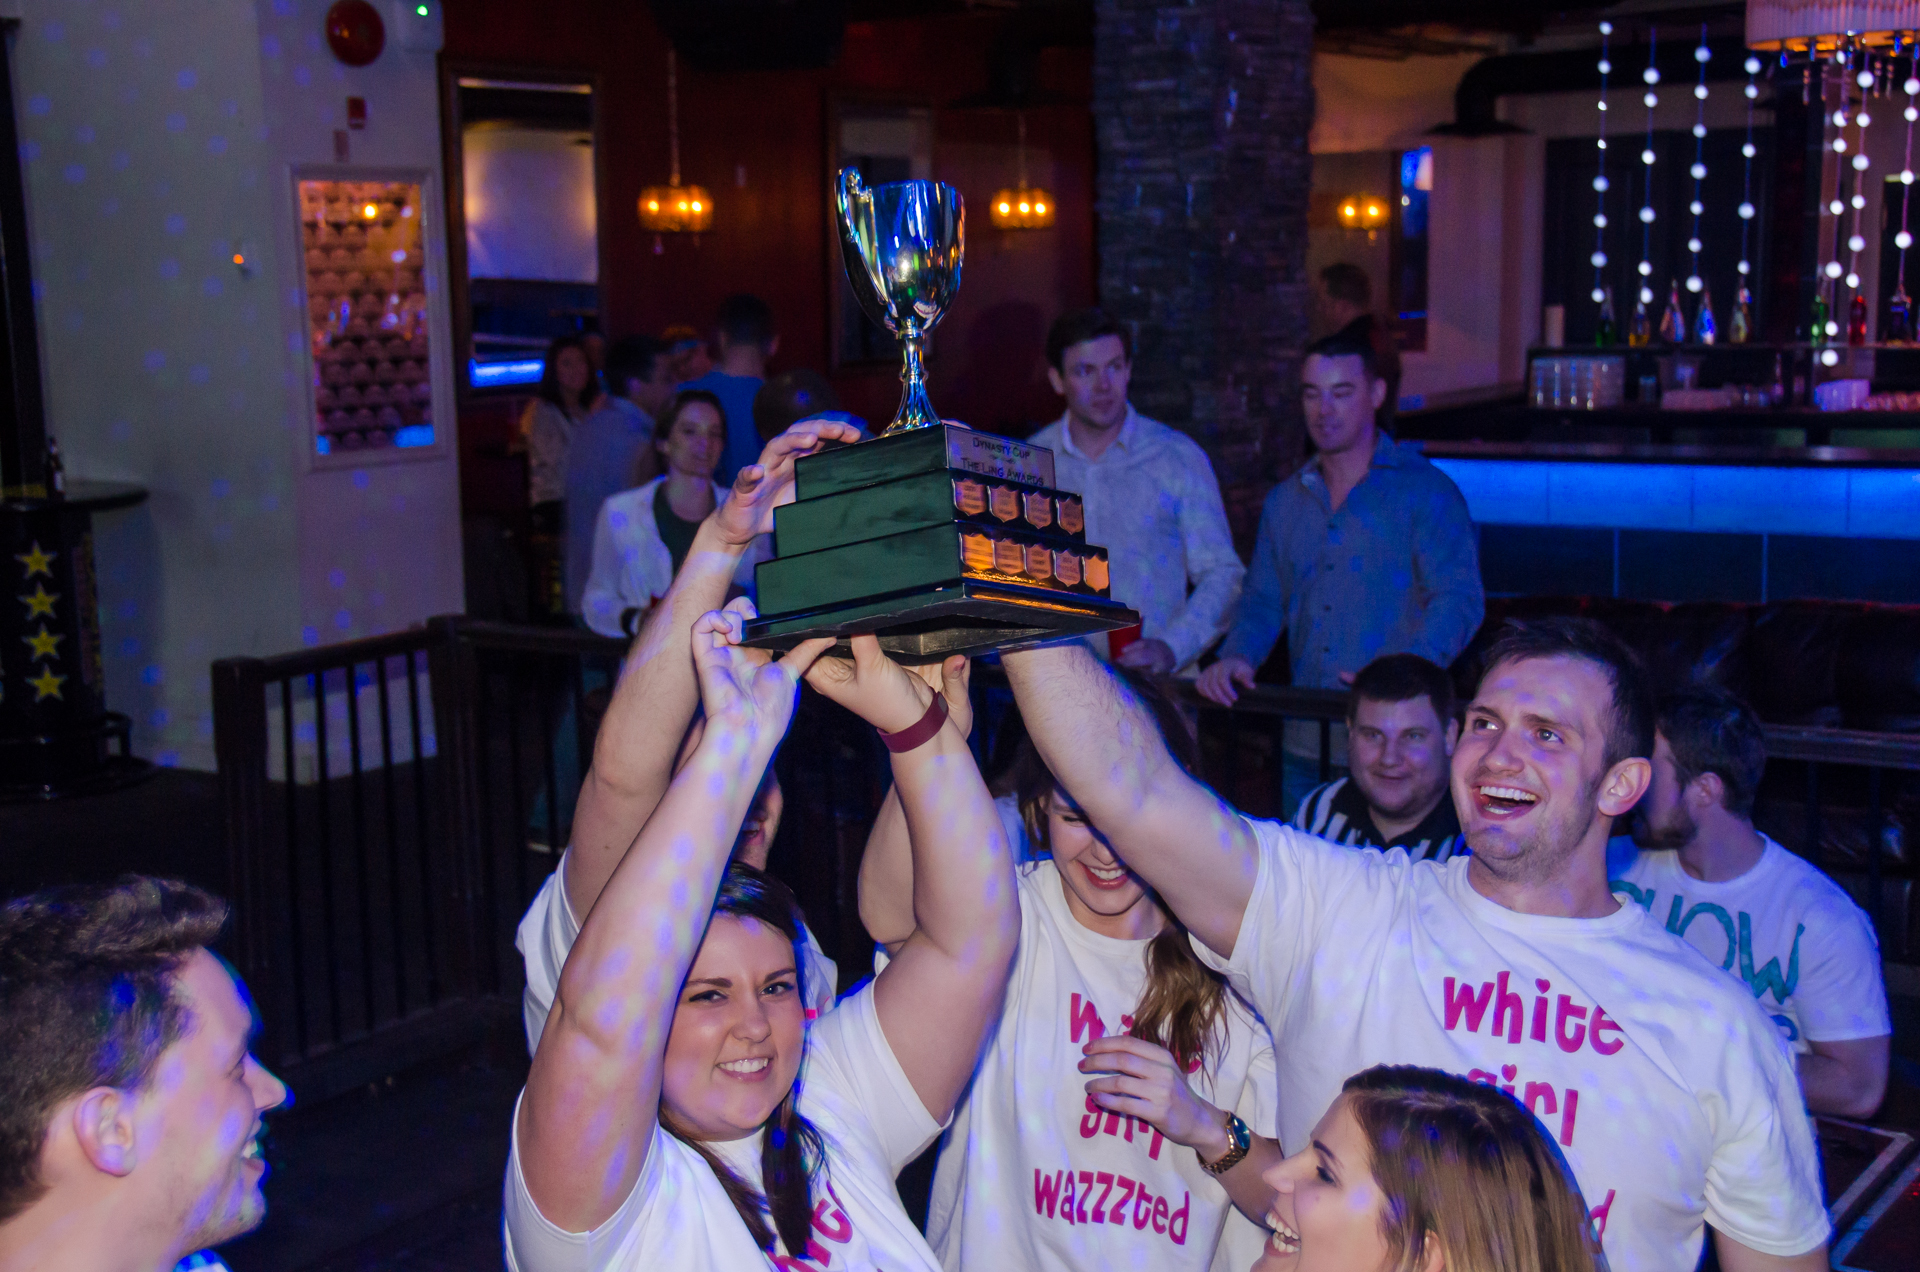 The 2015 ITCF Champions